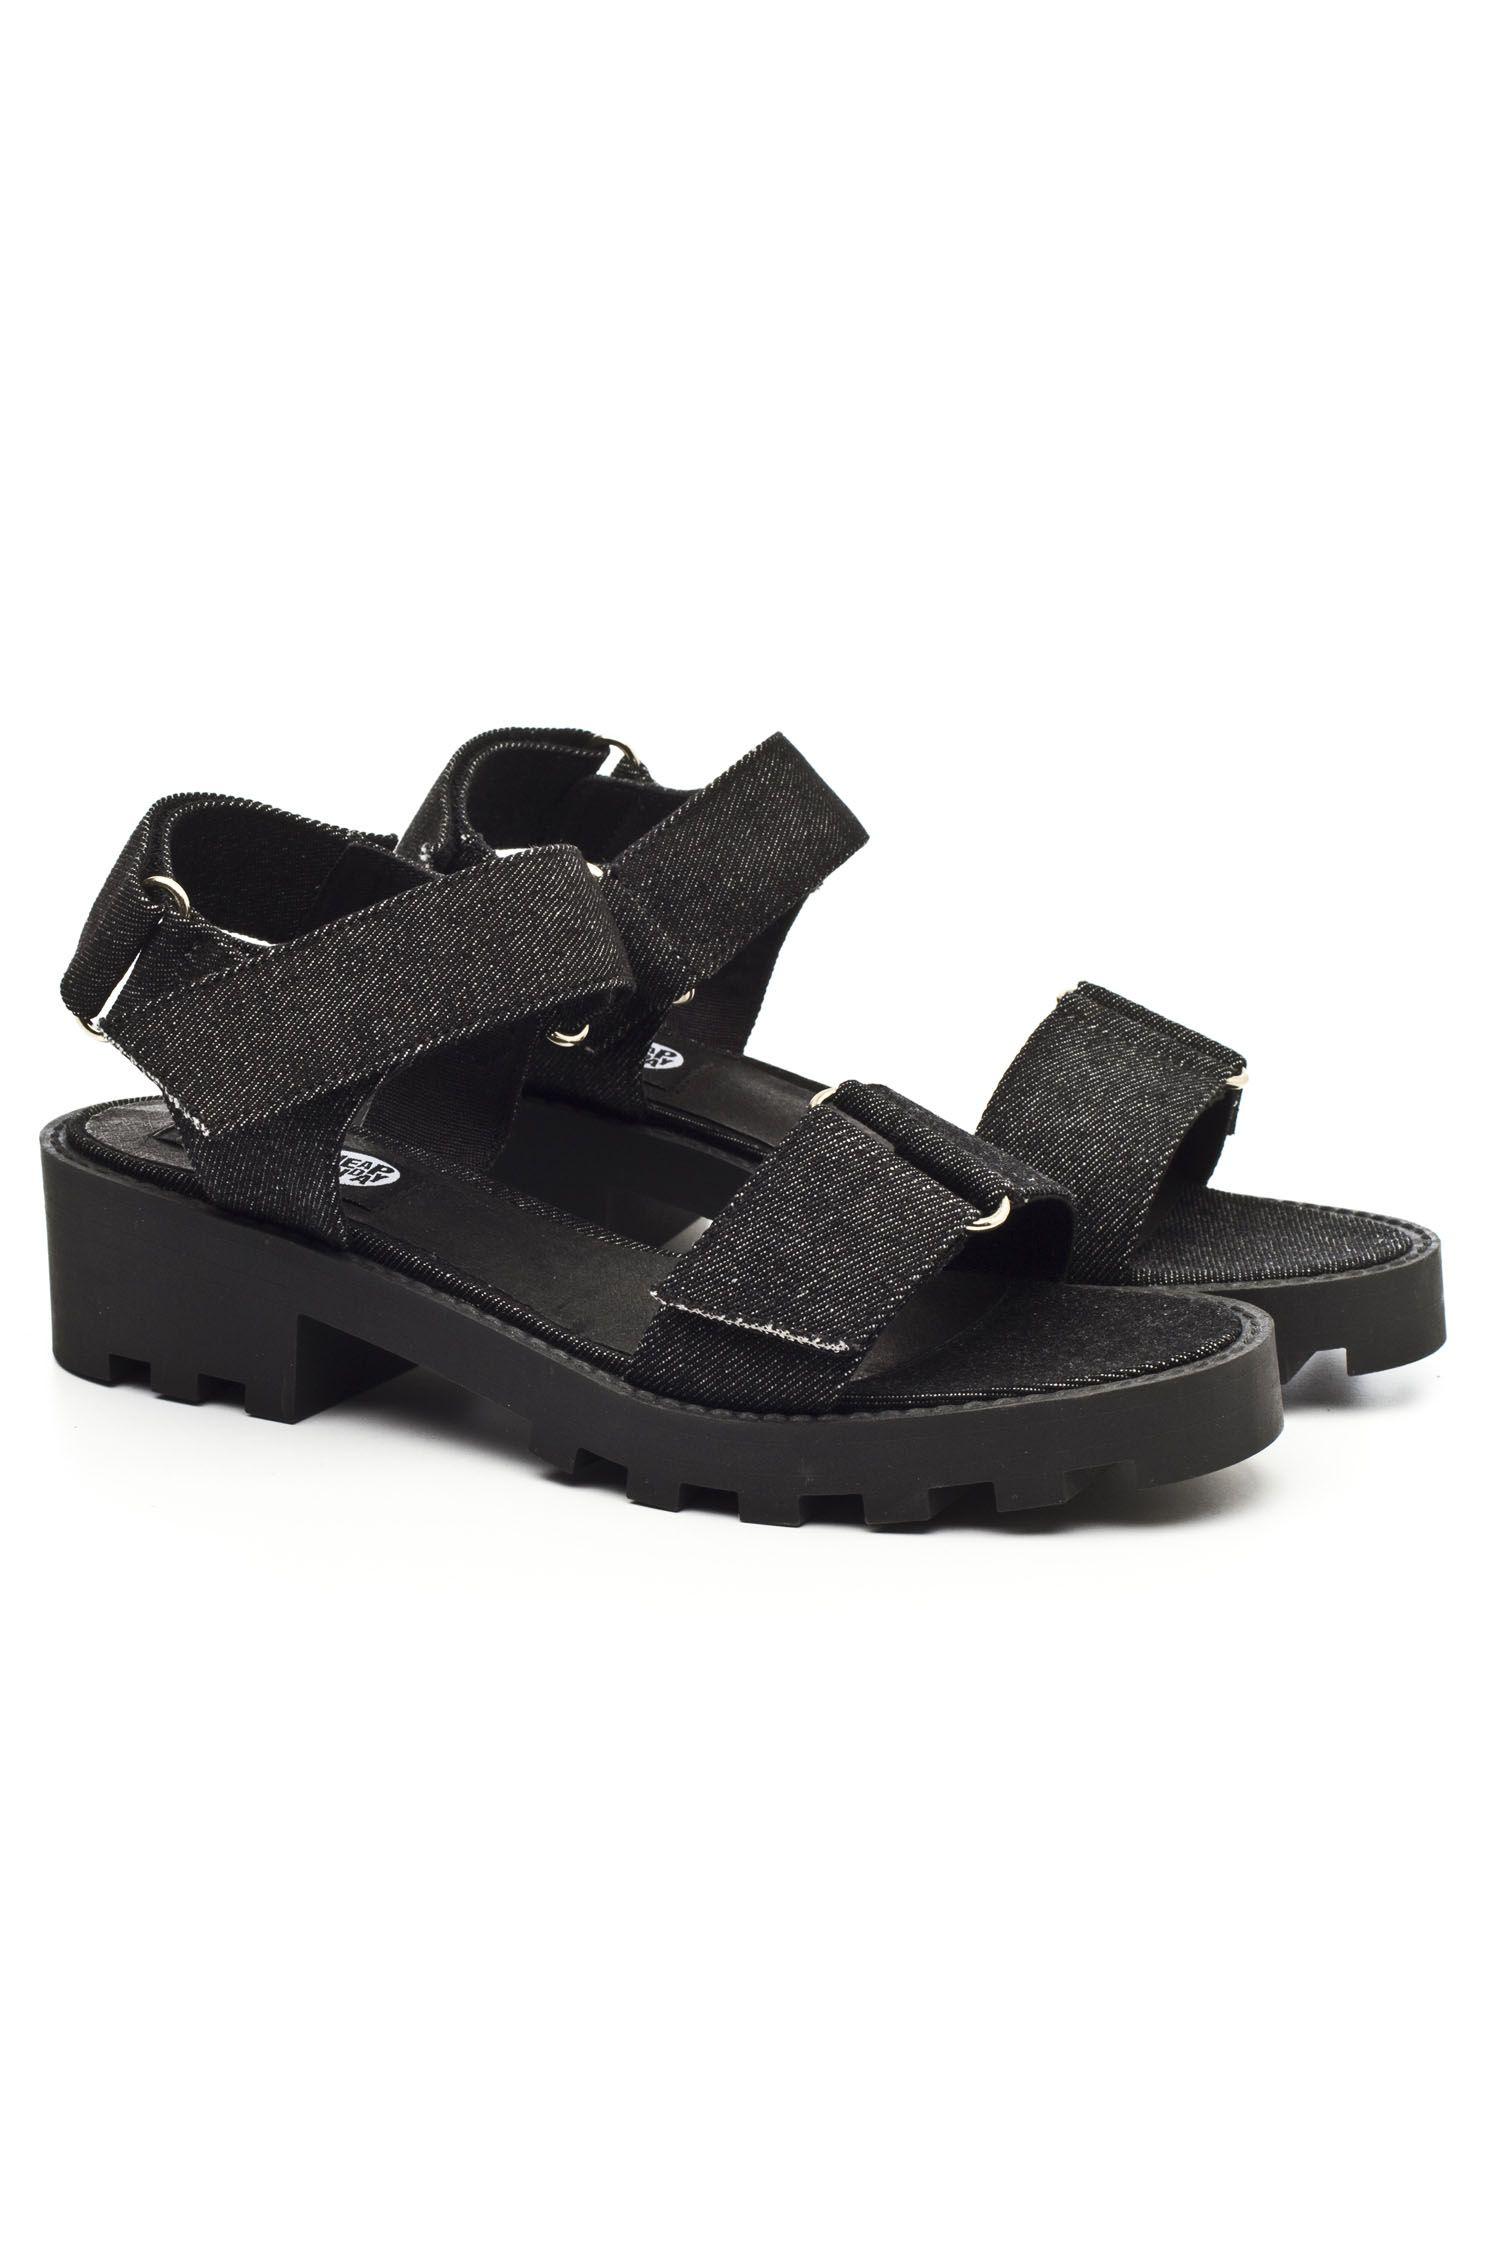 Chaussures - Sandales Pas Cher Lundi MZUFHJrEk